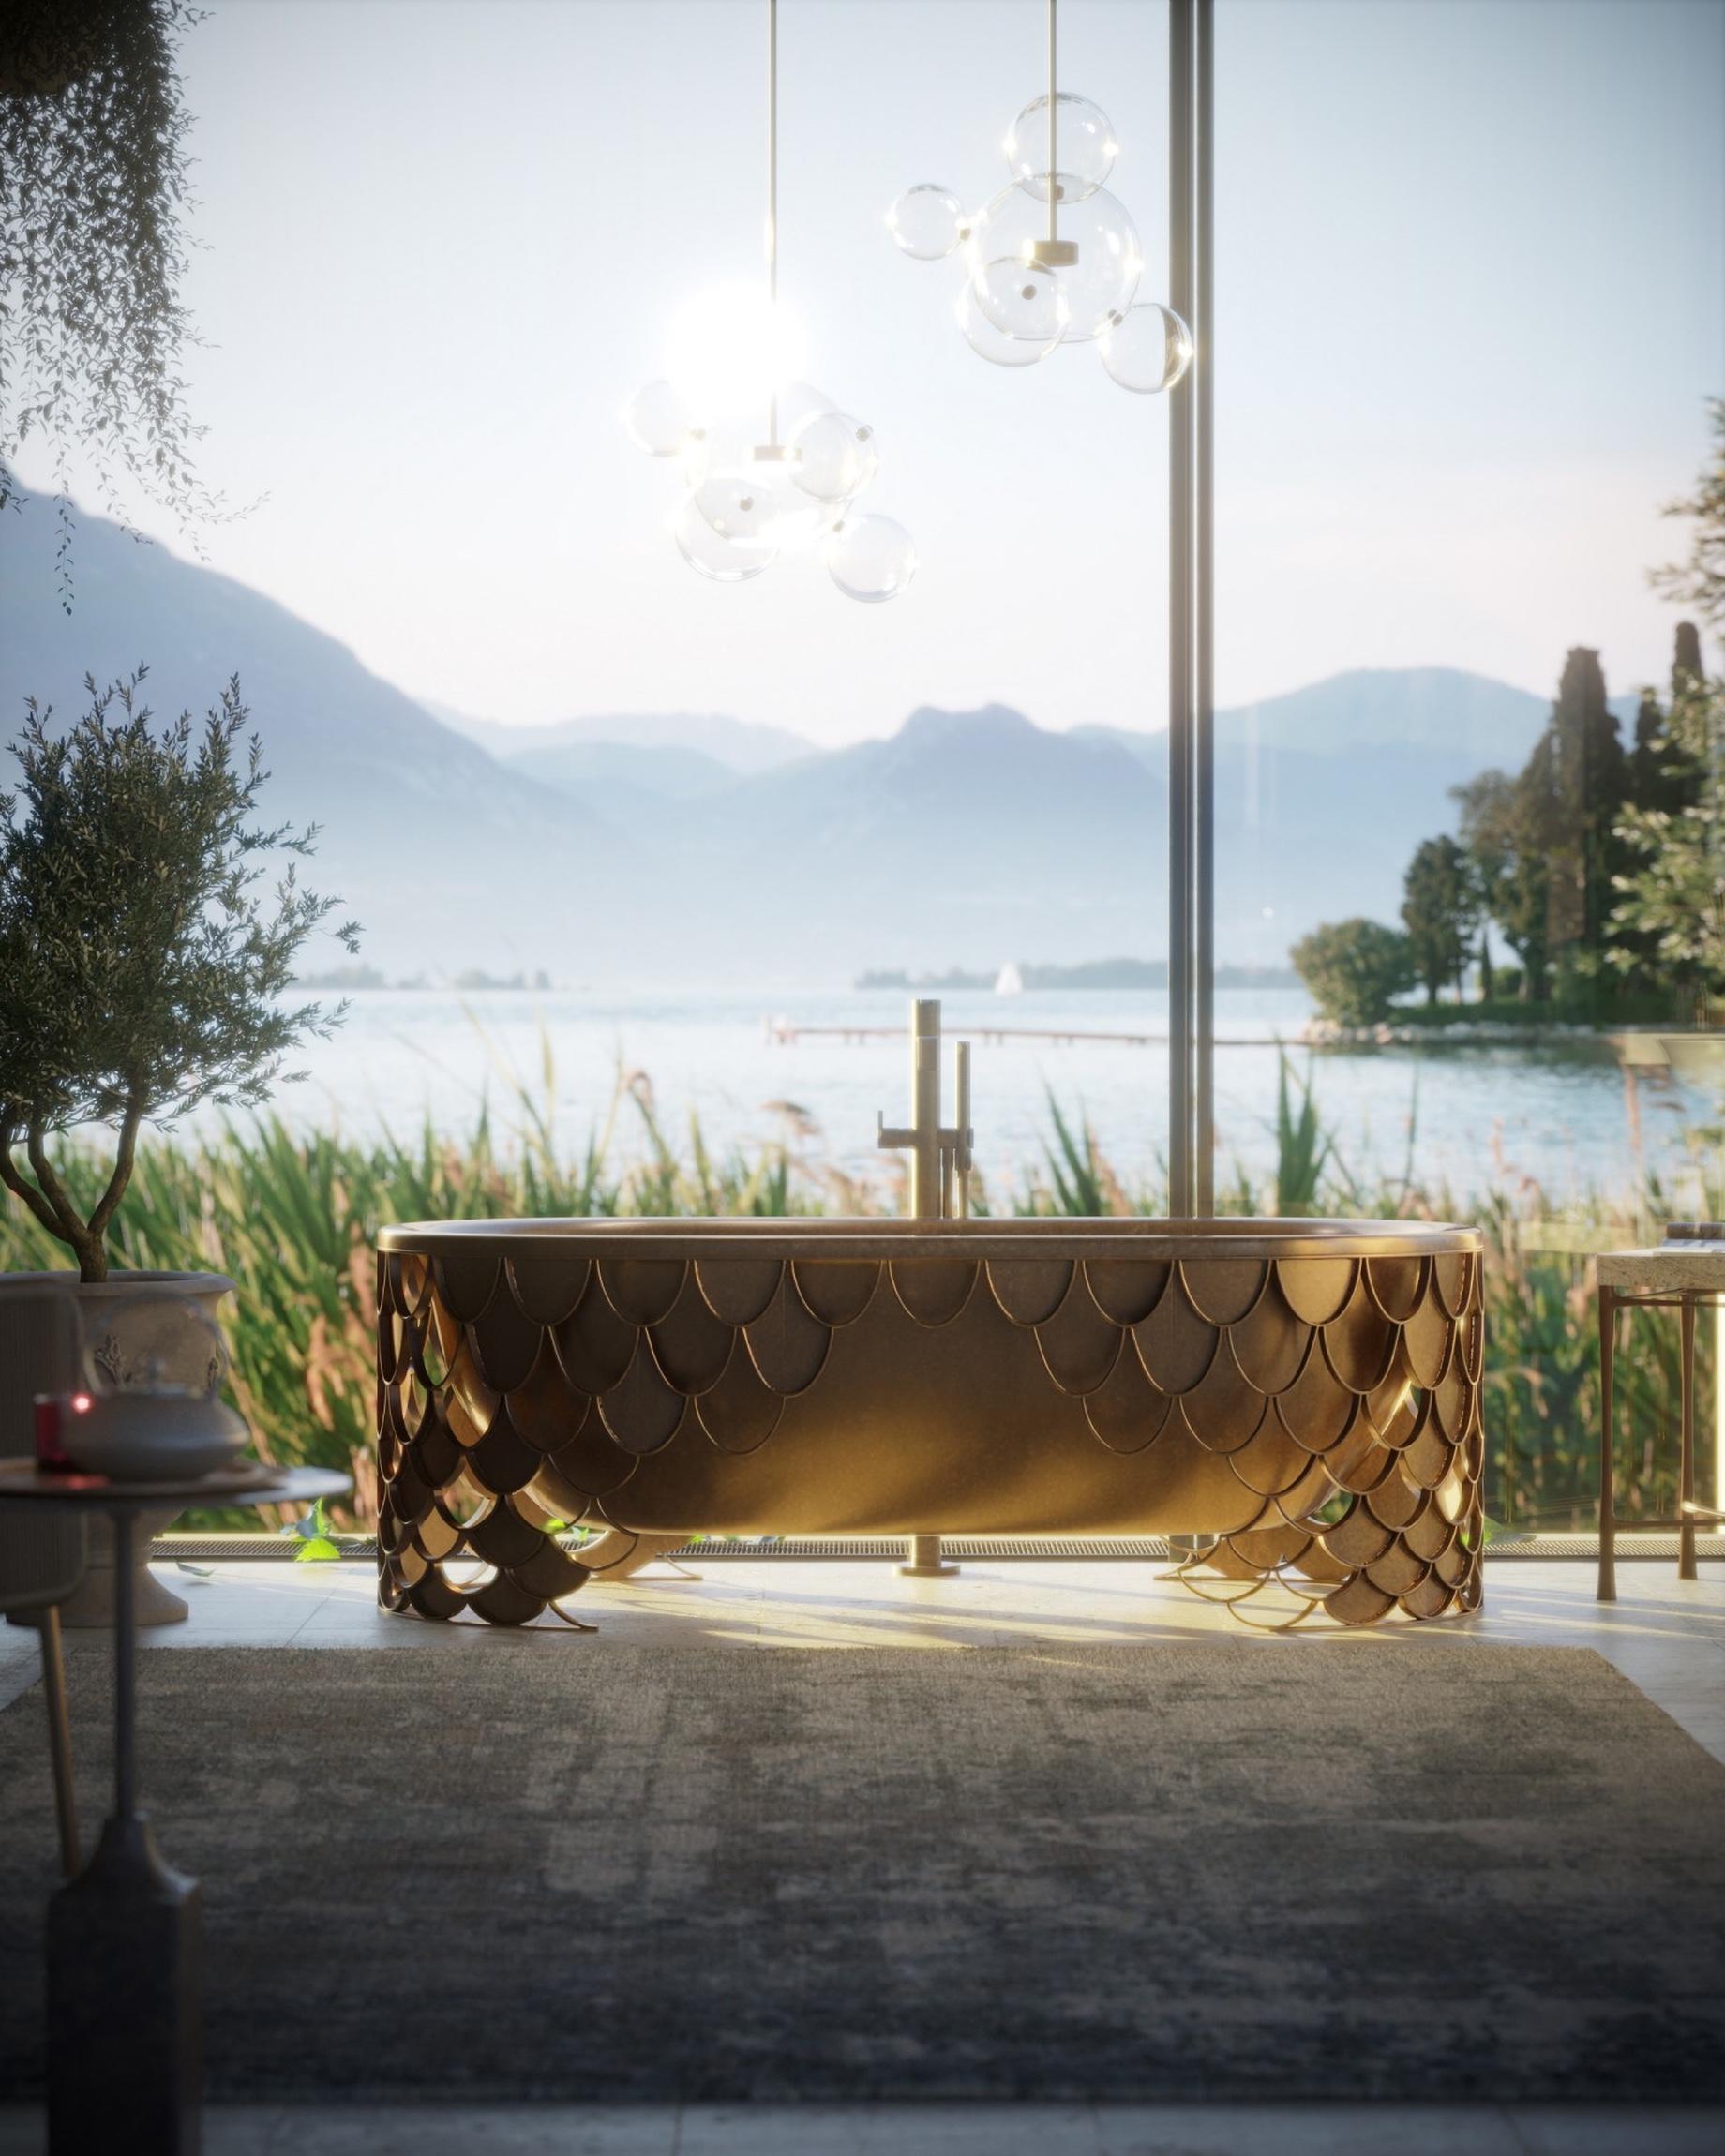 Freestanding Bathtubs - Top 6 Interior Design Trends for Luxury Living in California